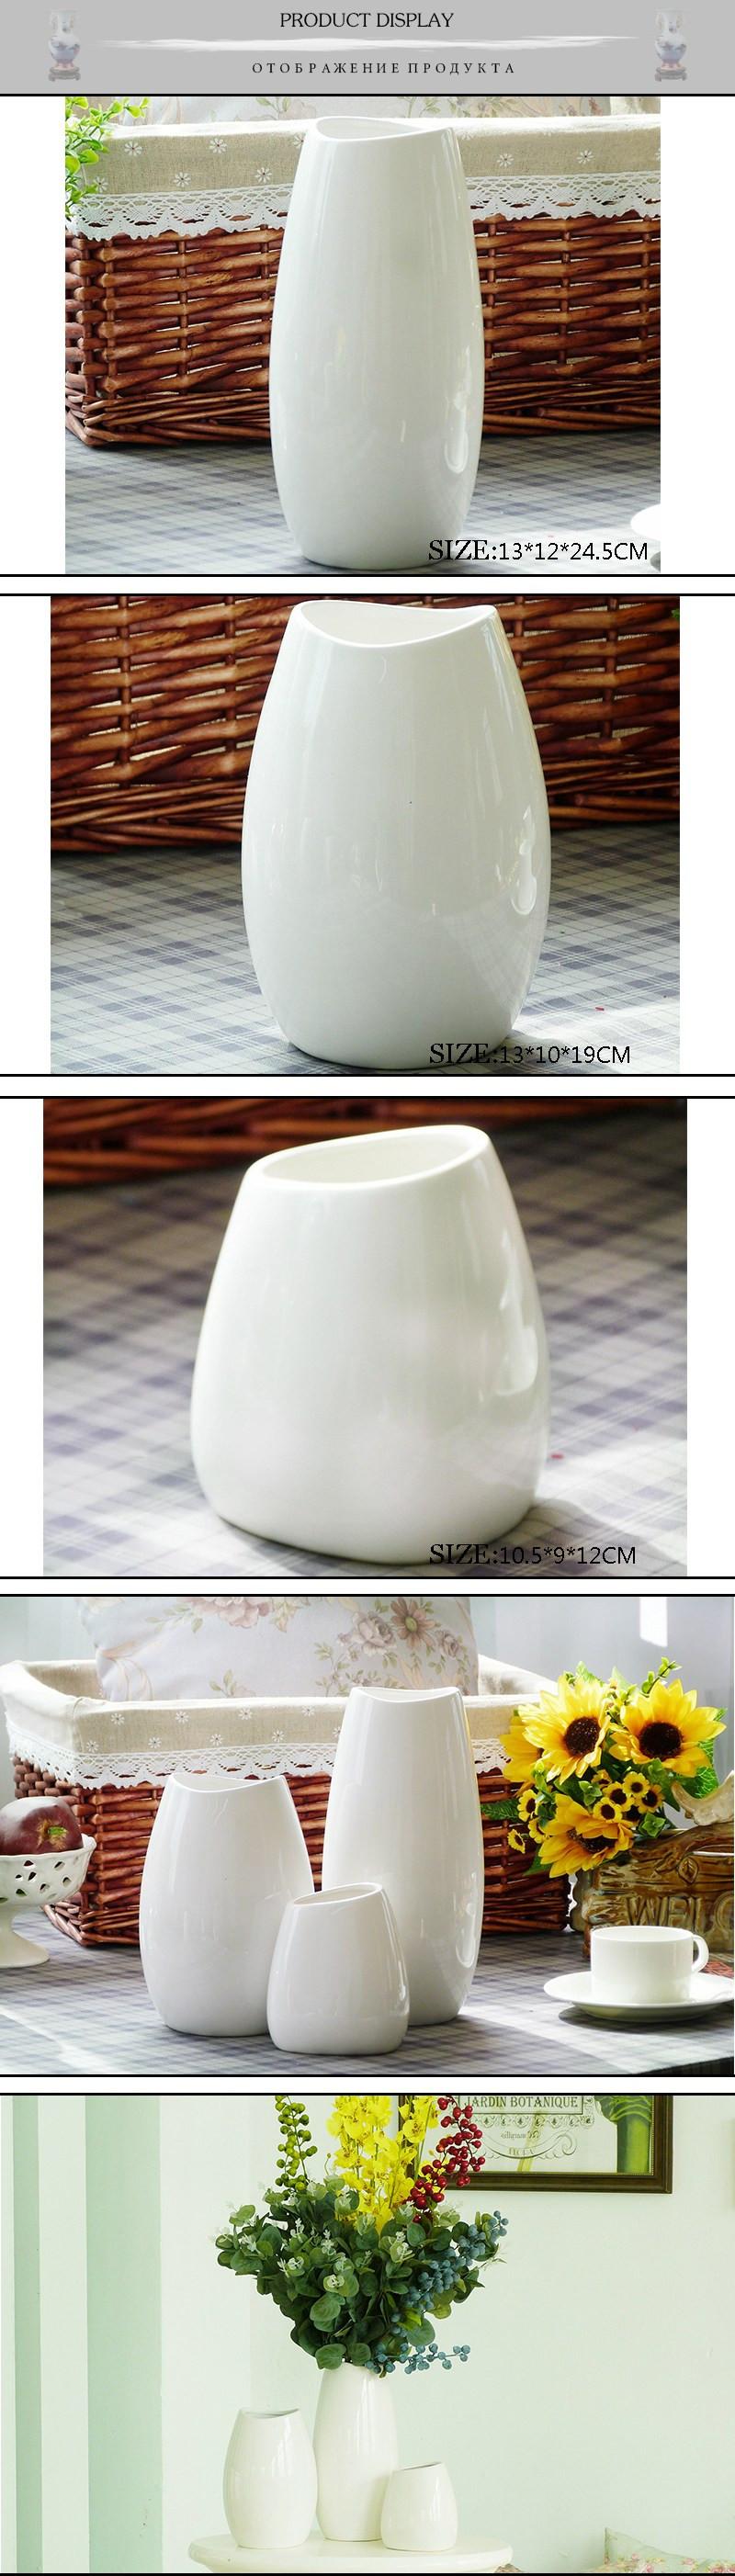 mikasa blossom vase of a‰§classic crafts white porcelain vase modern desktop small vase intended for classic crafts white porcelain vase modern desktop small vase creative home decoration gifts ulknn